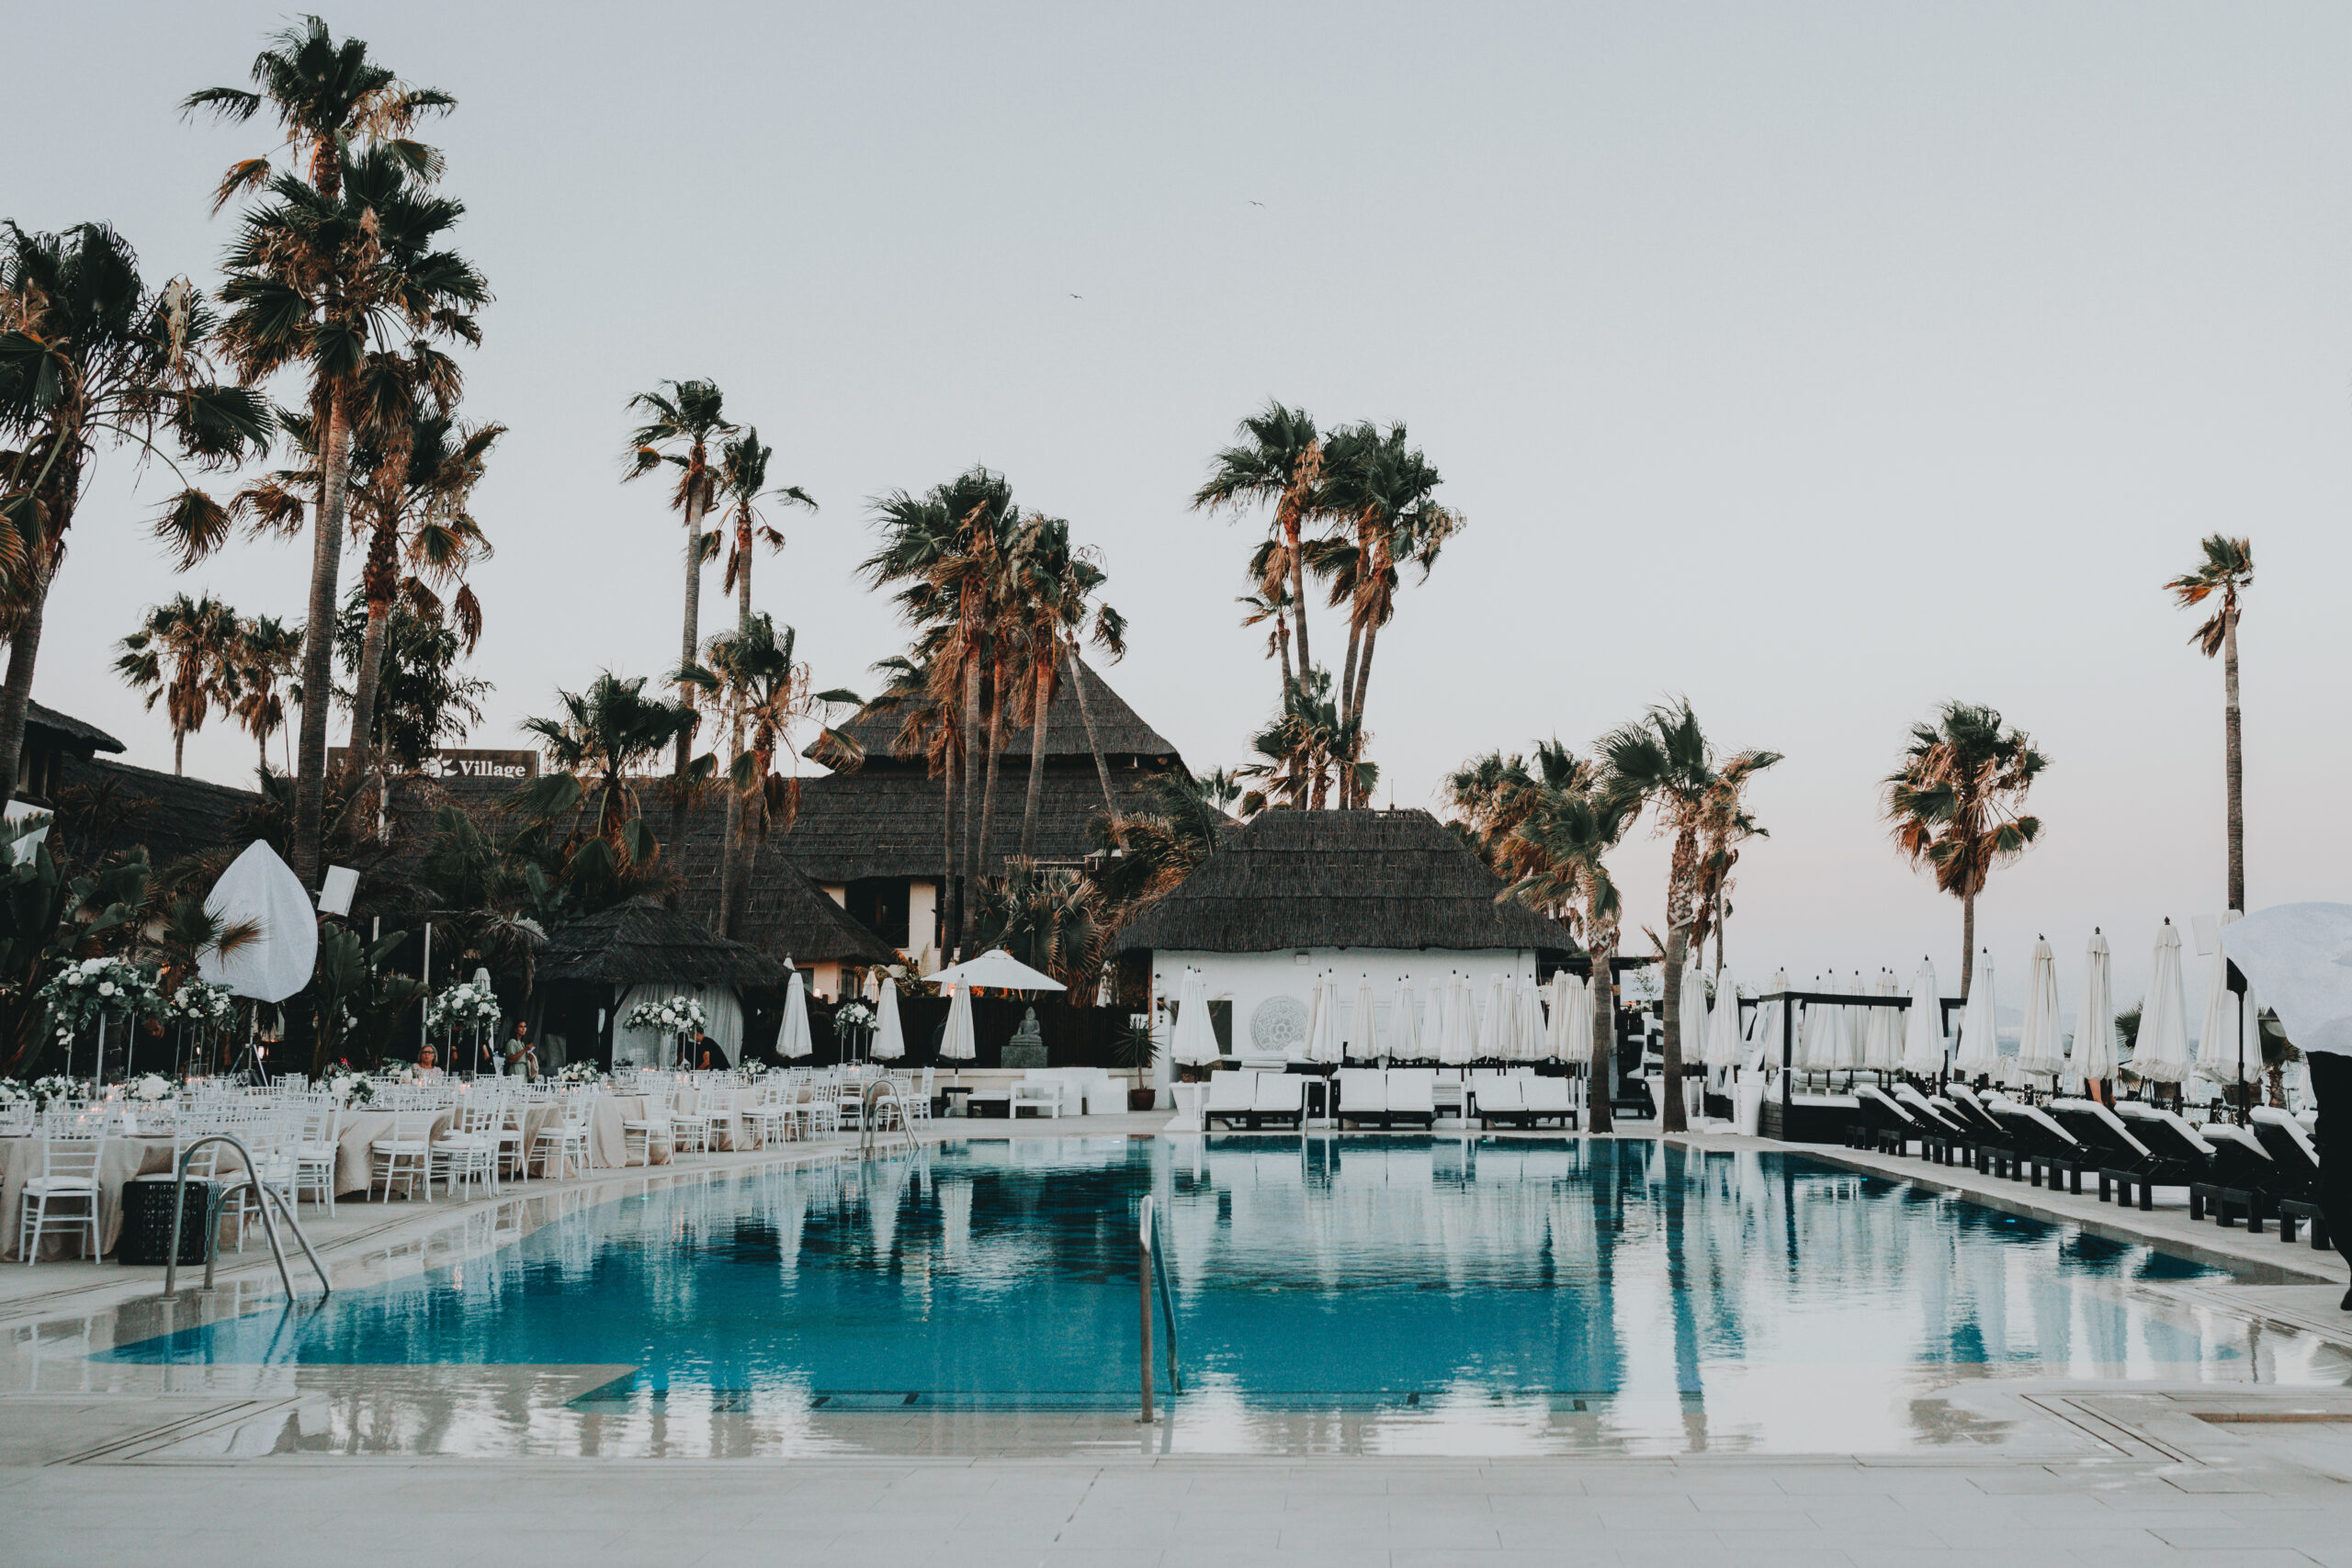 The luxurious beach club pool - Gino K photography